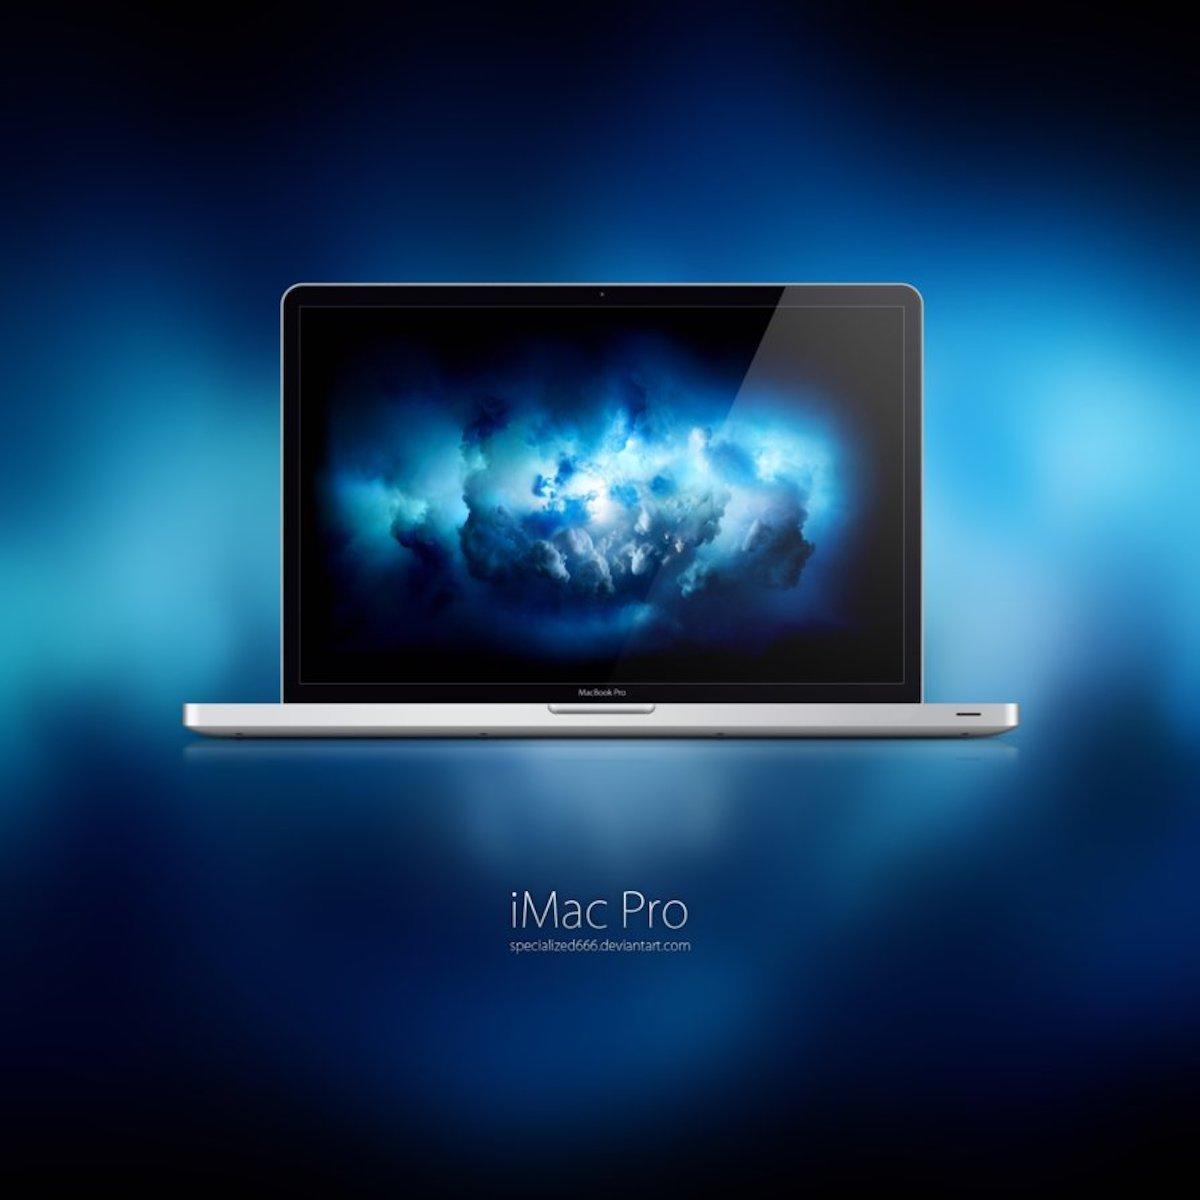 iMac Pro wallpaper